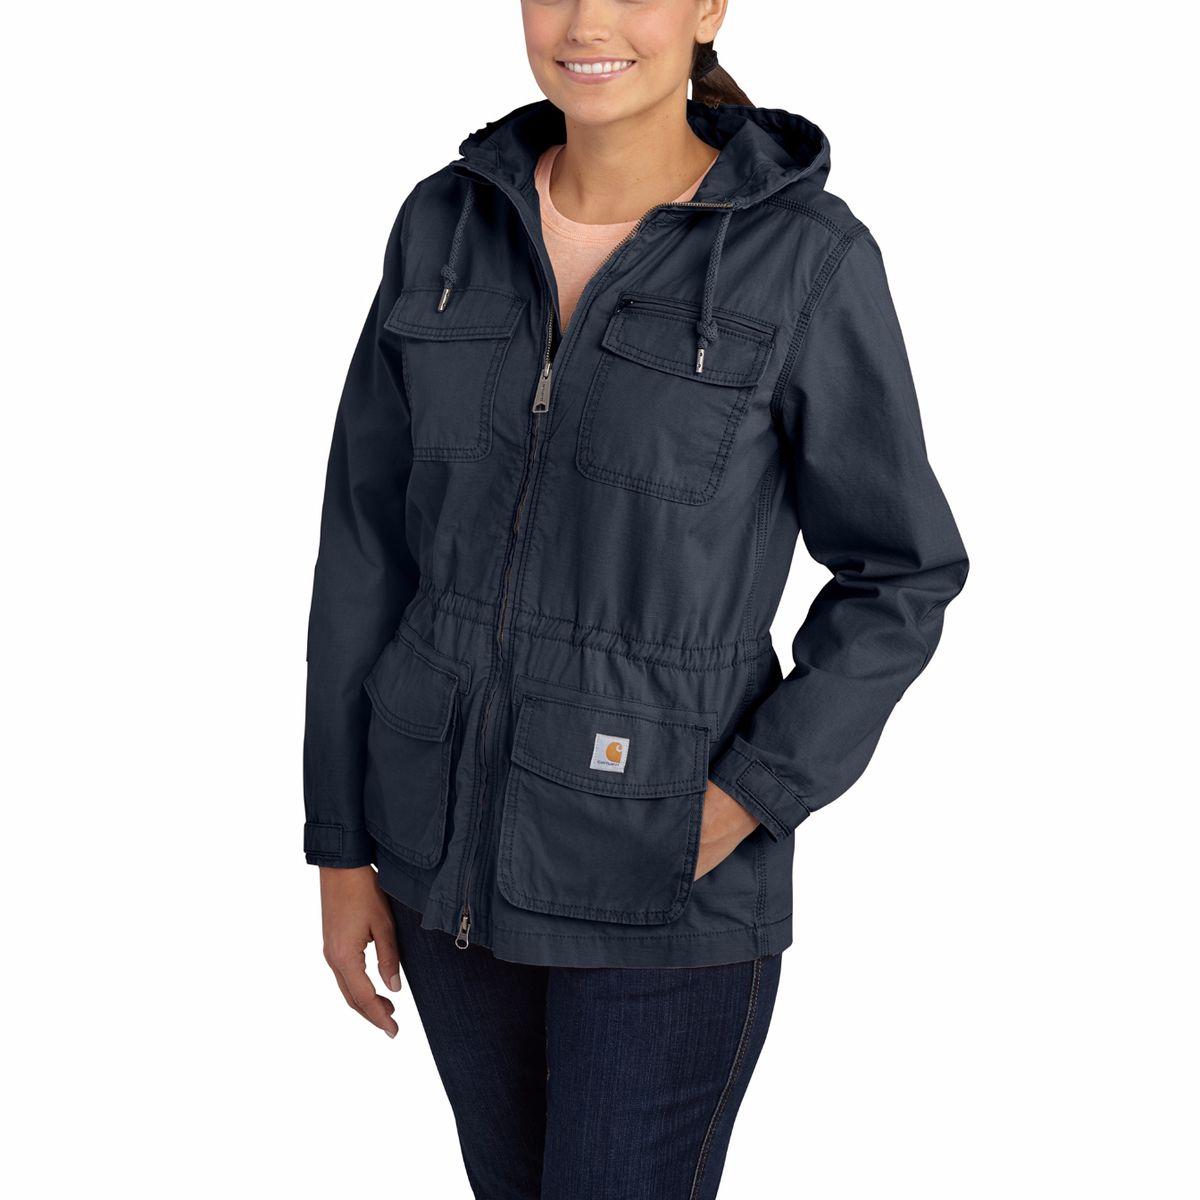 Carhartt El Paso Utility Jacket - Women